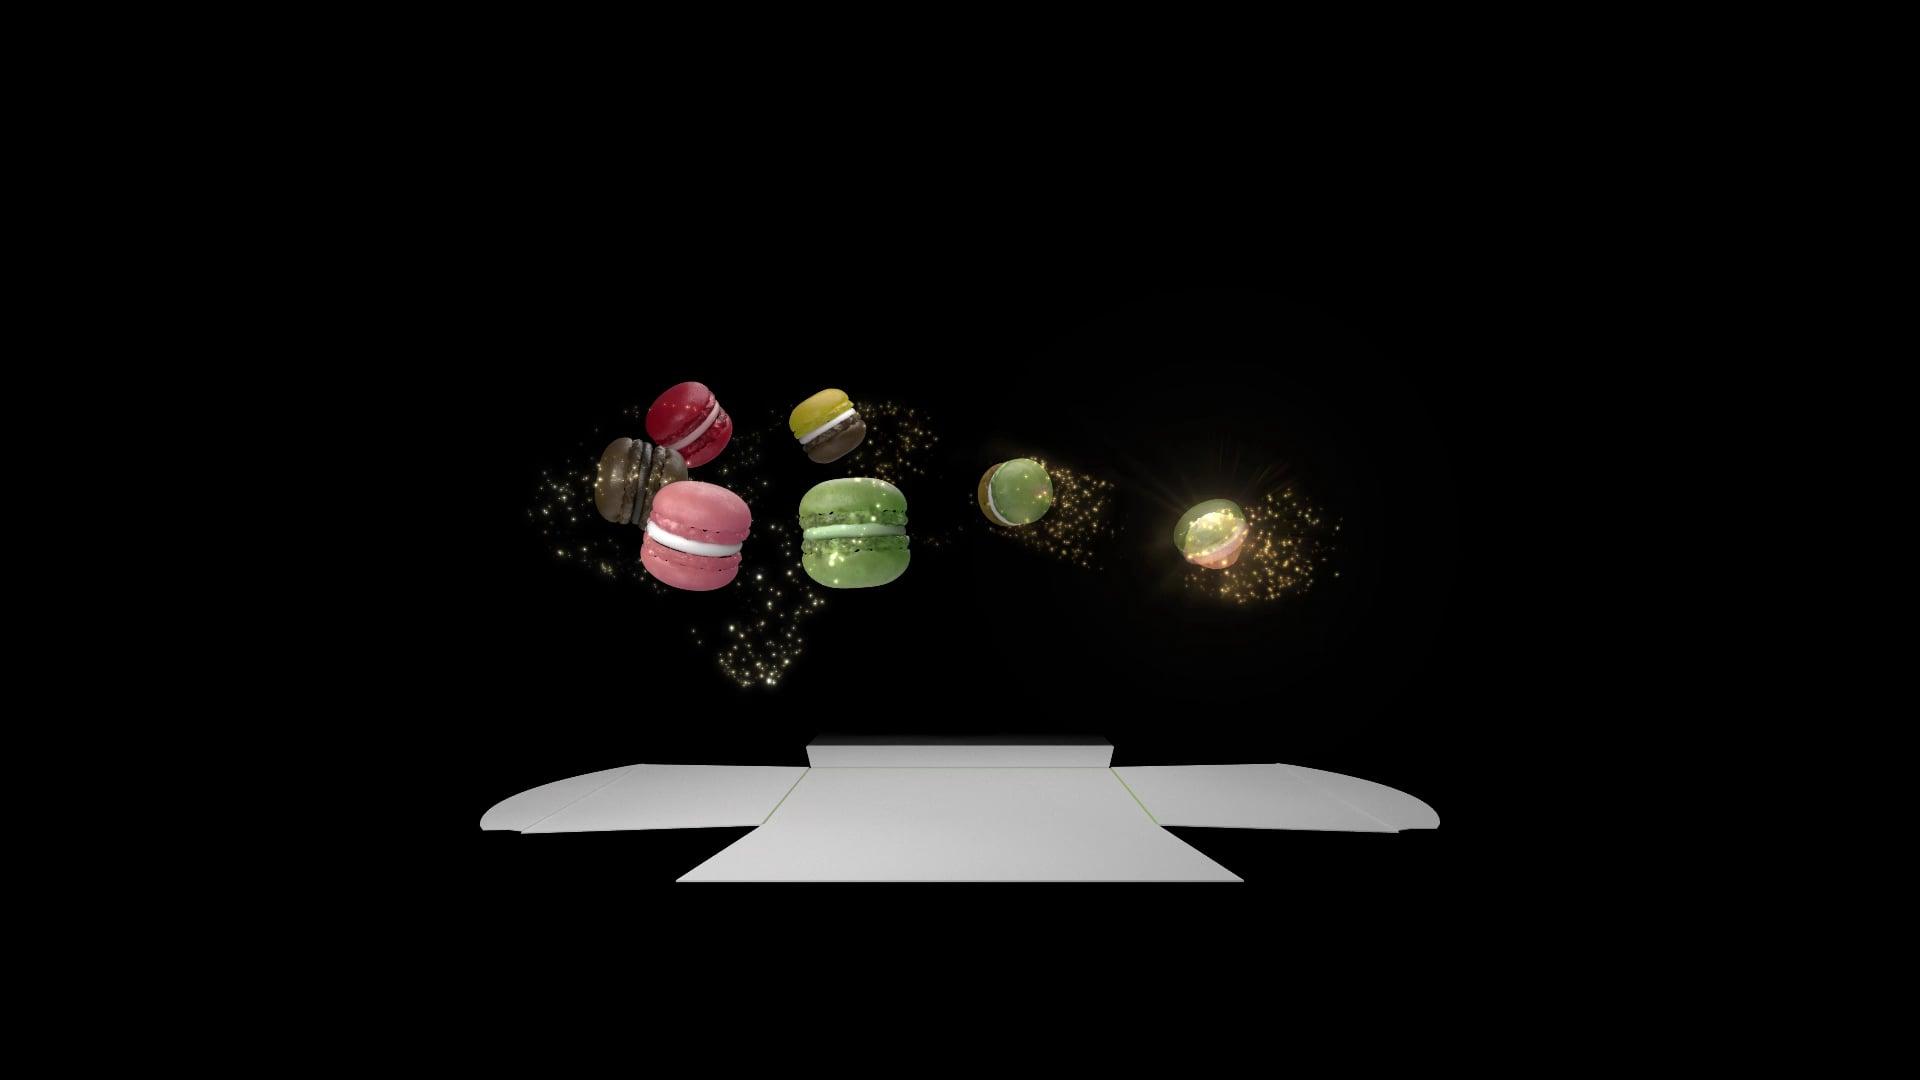 Luxemburgerli Sprüngli (Hologramm)